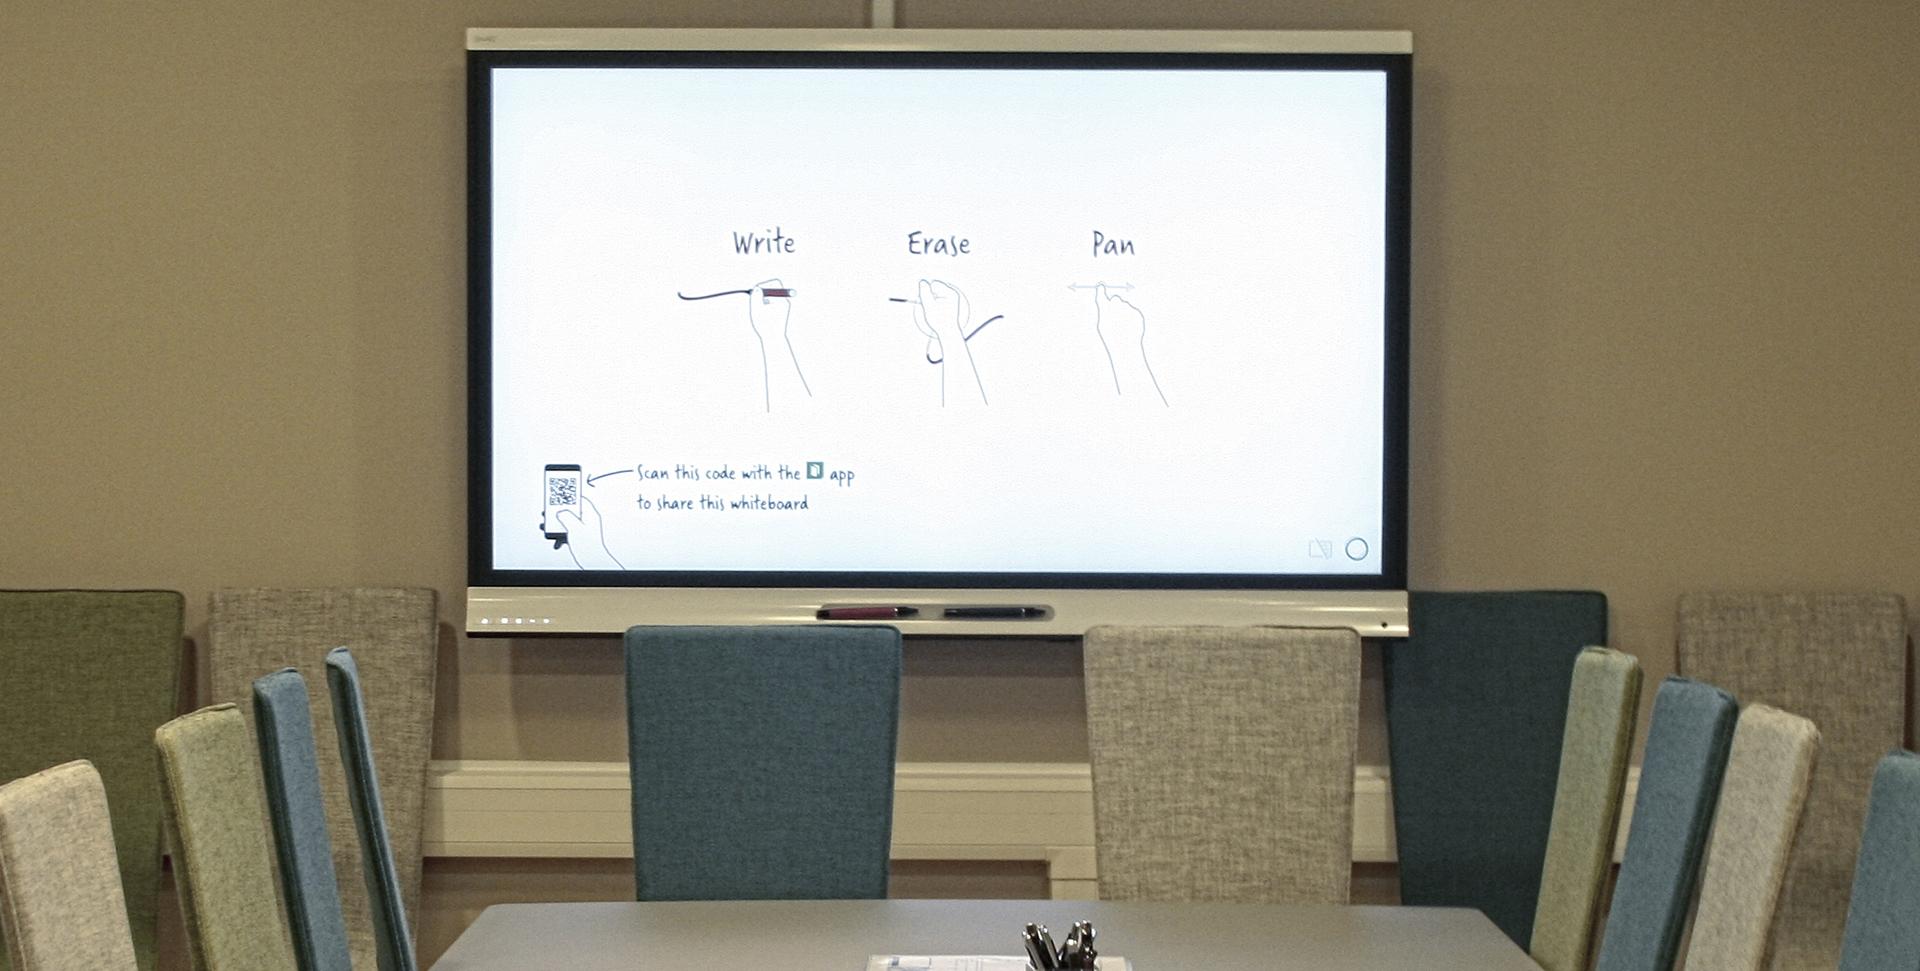 Advokatfirmaet Grette interaktiv SMART kapp iQ flatskjerm touch, liten teaser